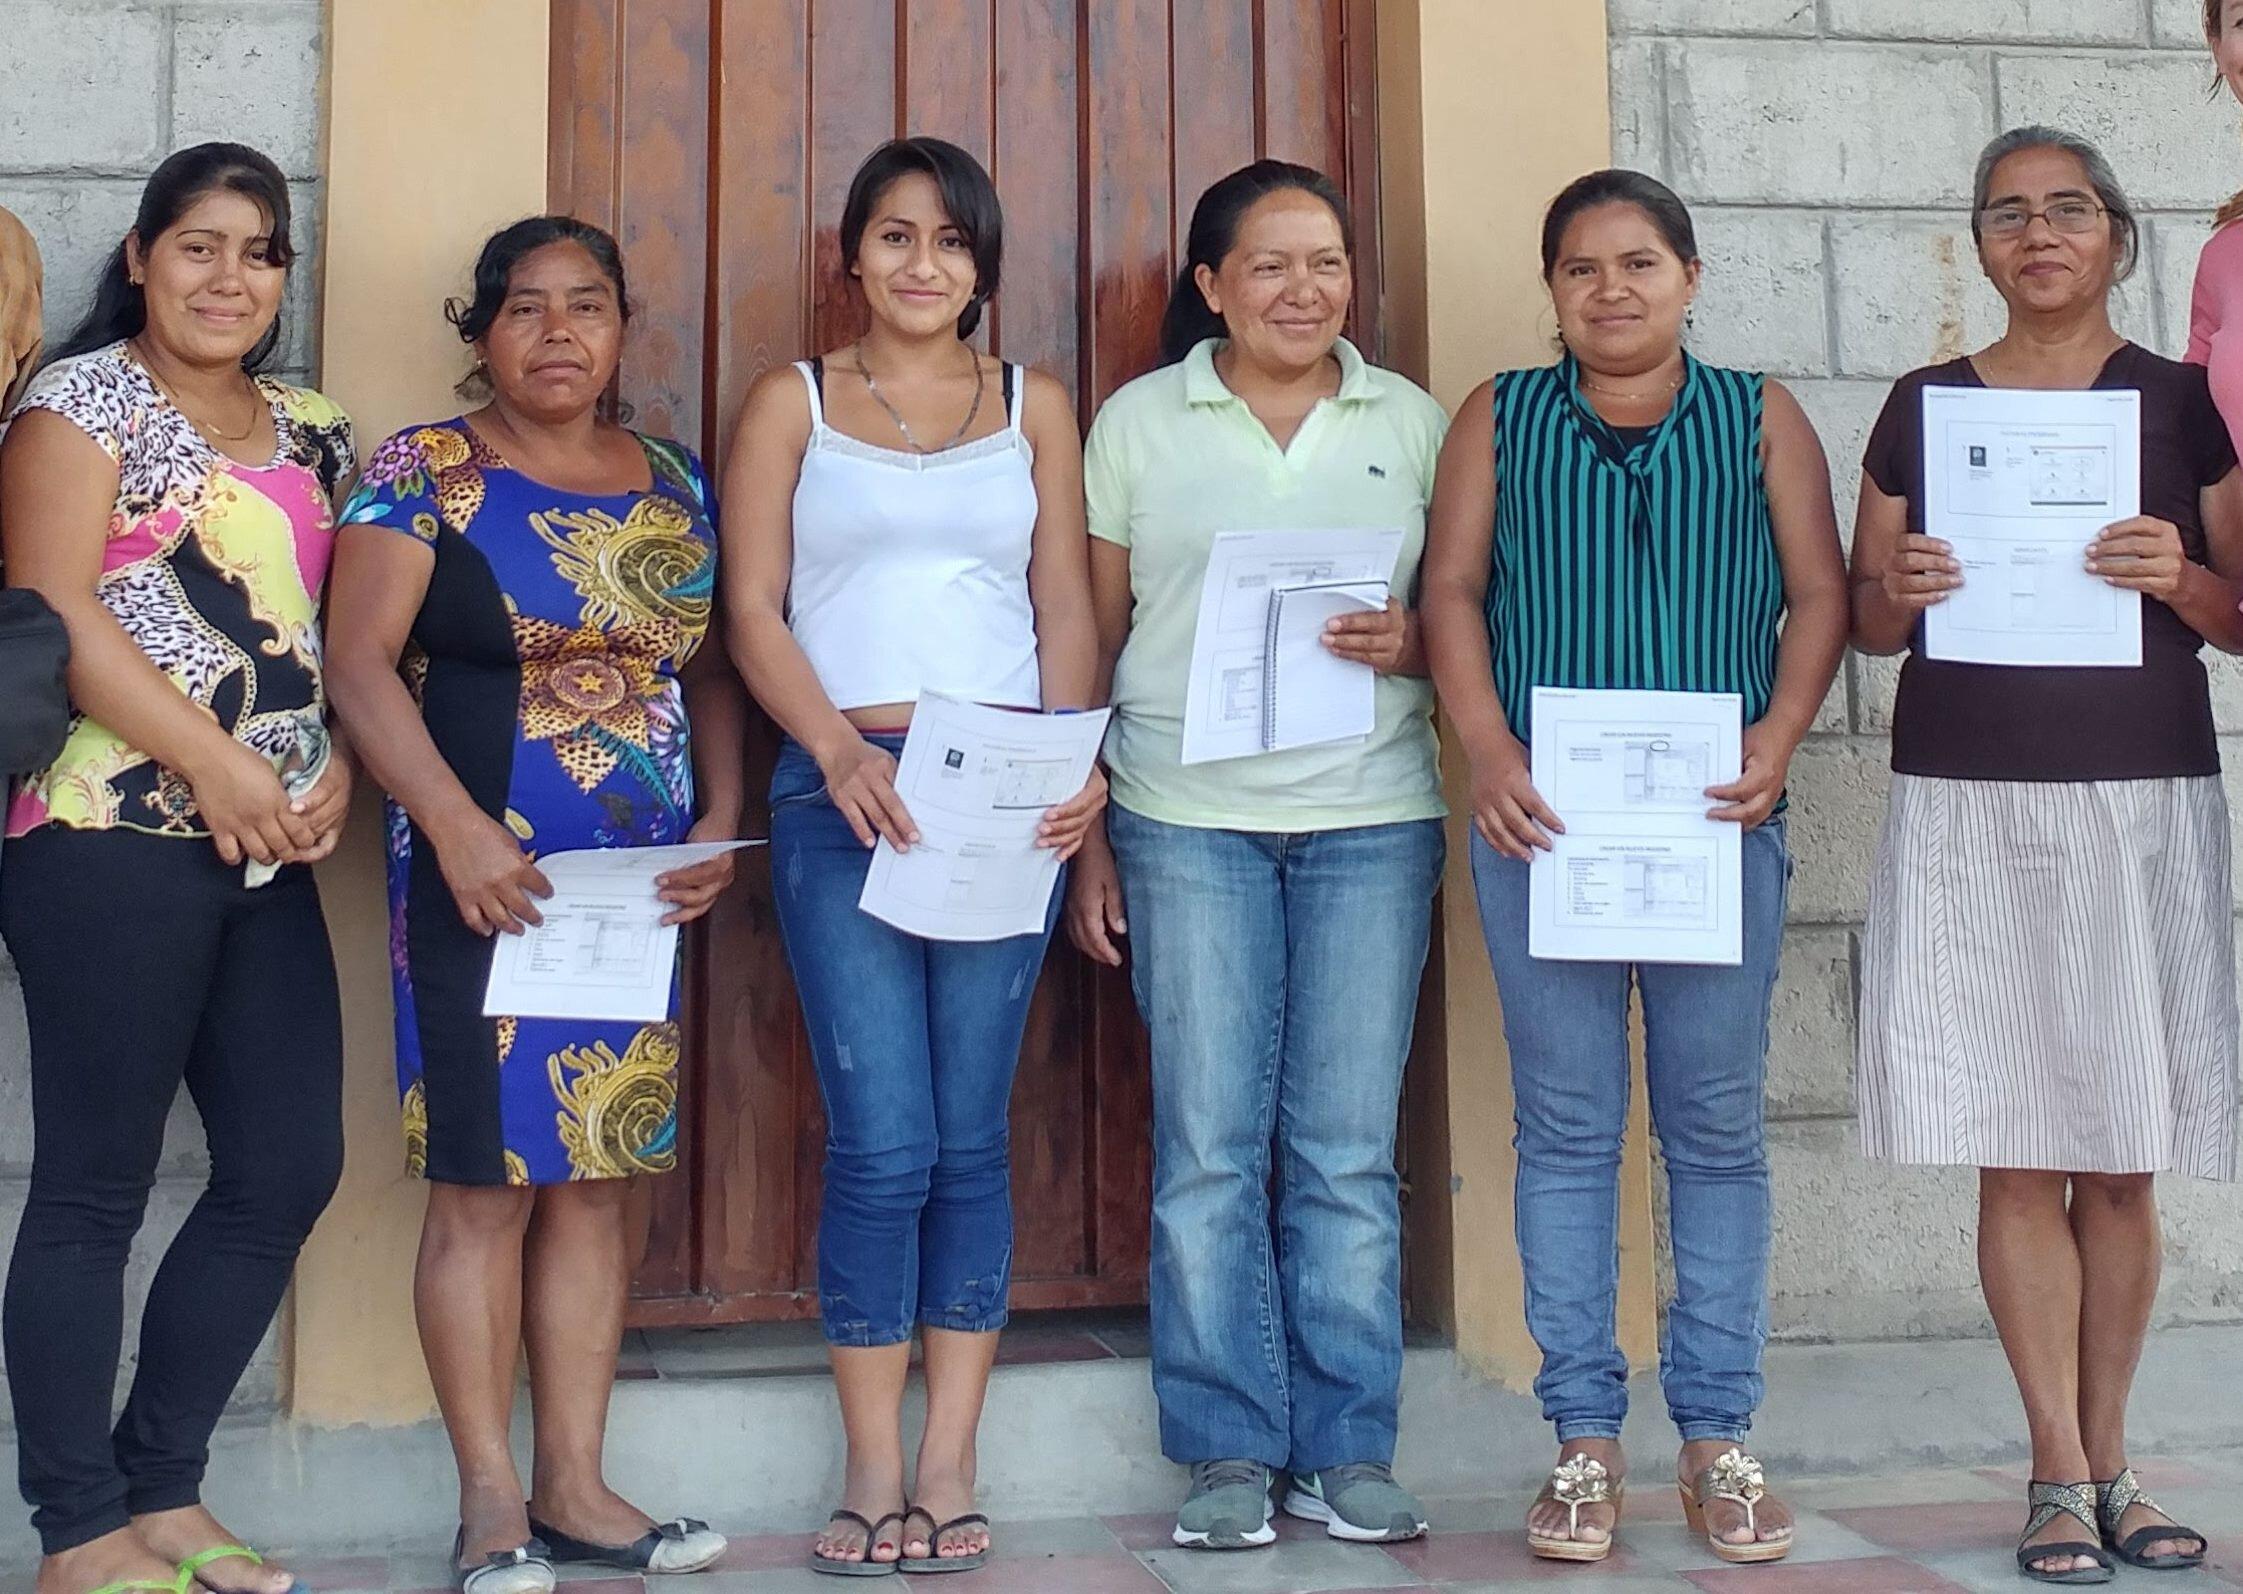 community health worker 2019 san antonio libertad.jpg